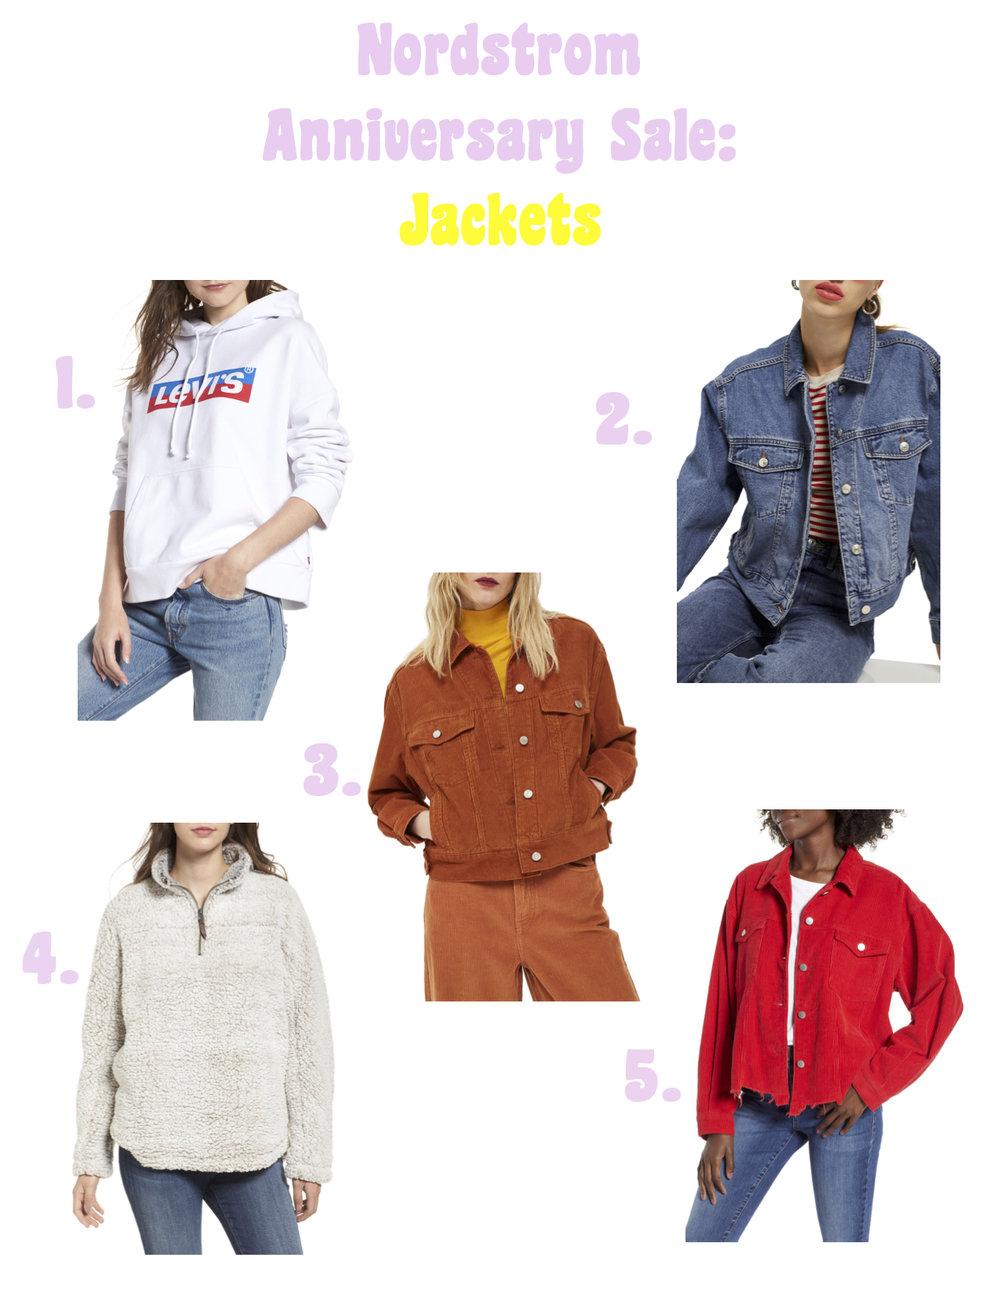 nordstrom anniversary sale- jackets.jpg